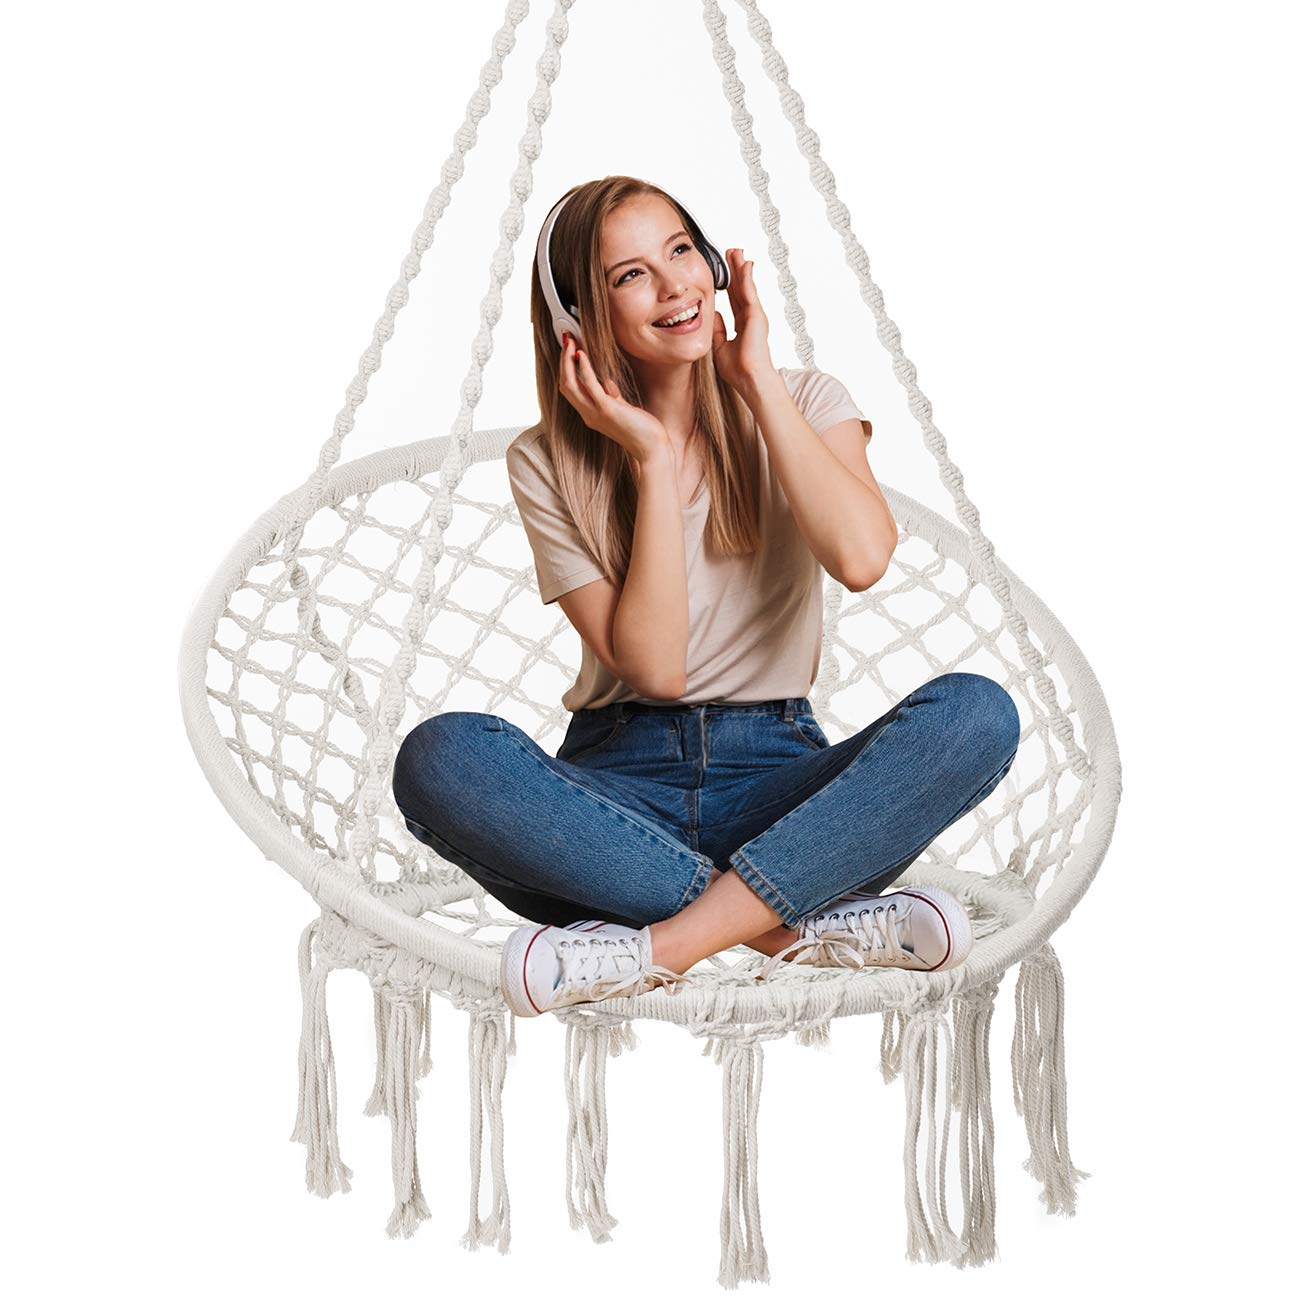 Showpin Hammock Chair Macrame Swing 330 Pound Capacity Handmade Hanging Swing Chair Prefect for Indoor Outdoor Home Patio Deck Yard Garden Reading Leisure Cream